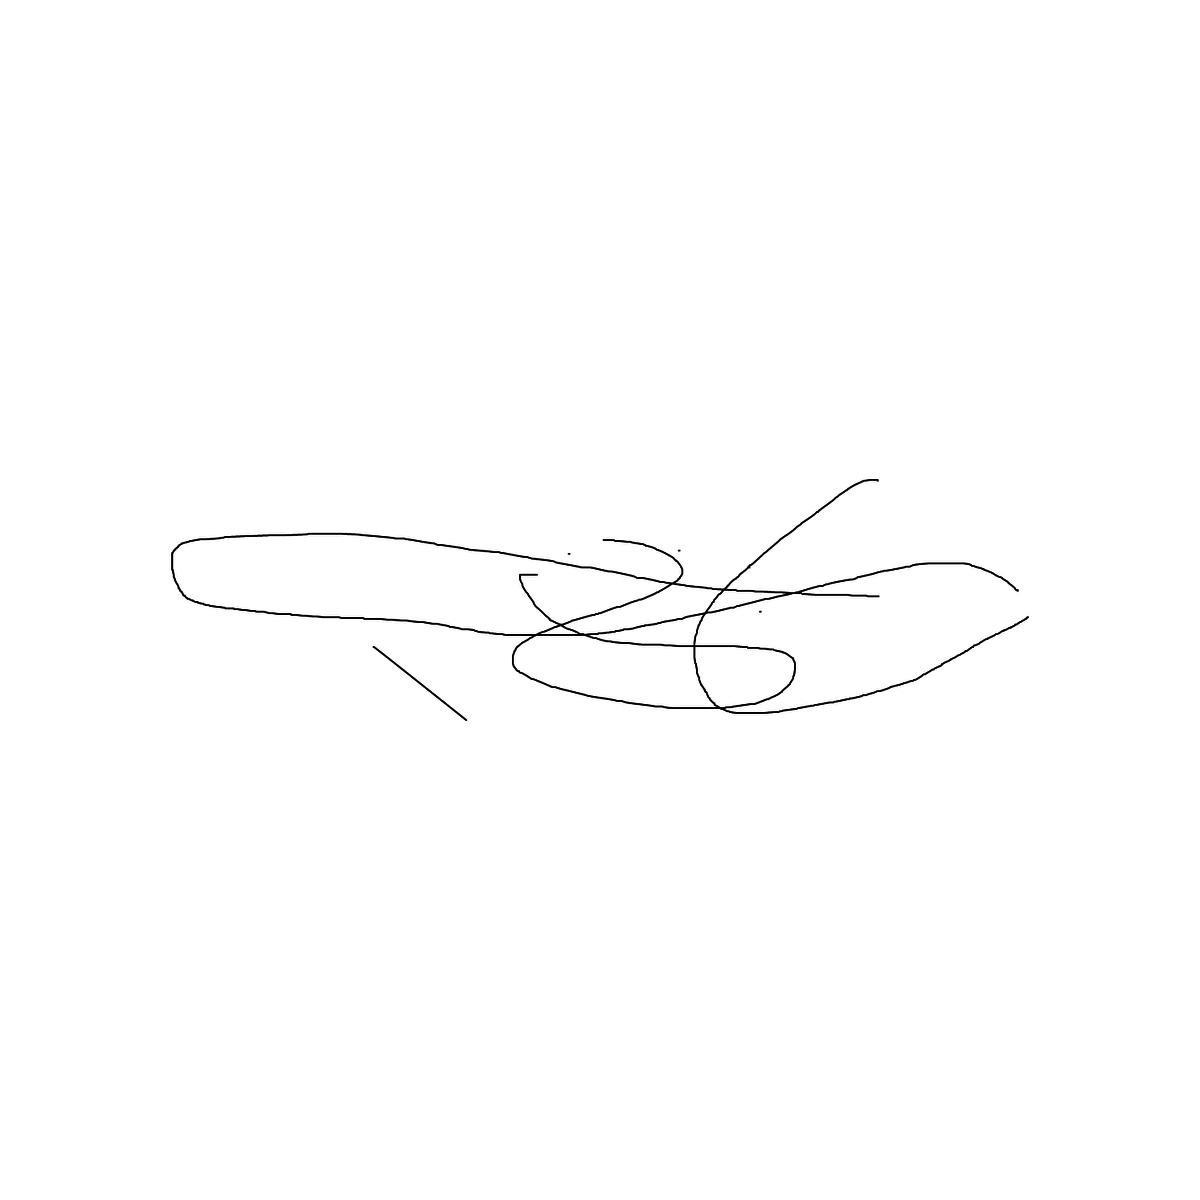 BAAAM drawing#2516 lat:49.5531349182128900lng: 6.3231039047241210